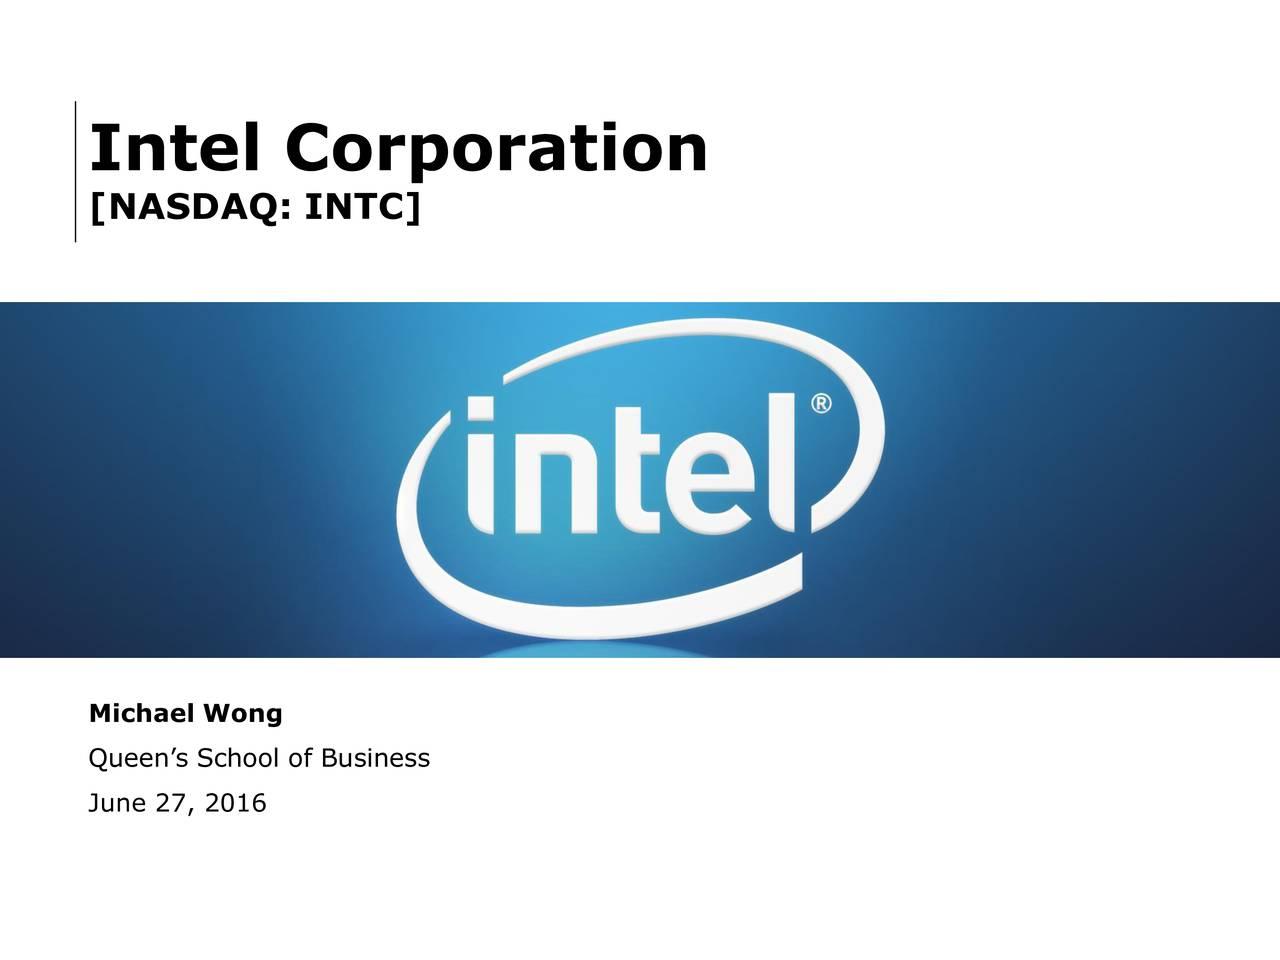 [NASDAQ: INTC] Michael Wong Queens School of Business June 27, 2016